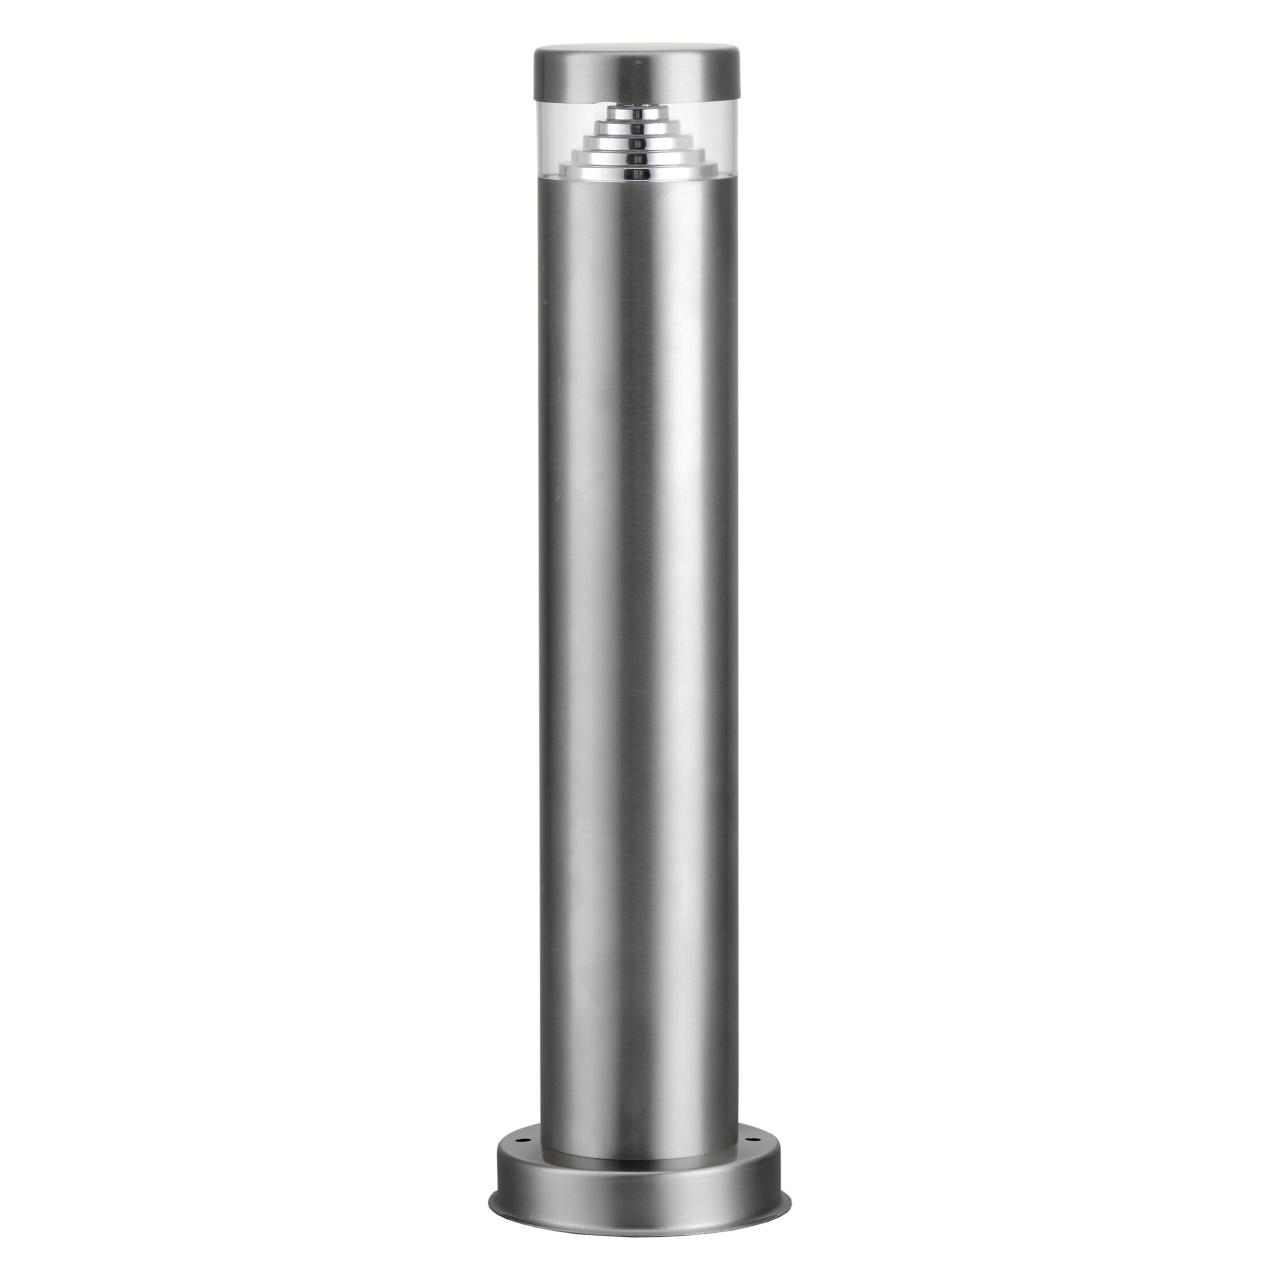 Светильник Raggio LED 6W 260LM алюминий 4000K IP55 Lightstar 376905